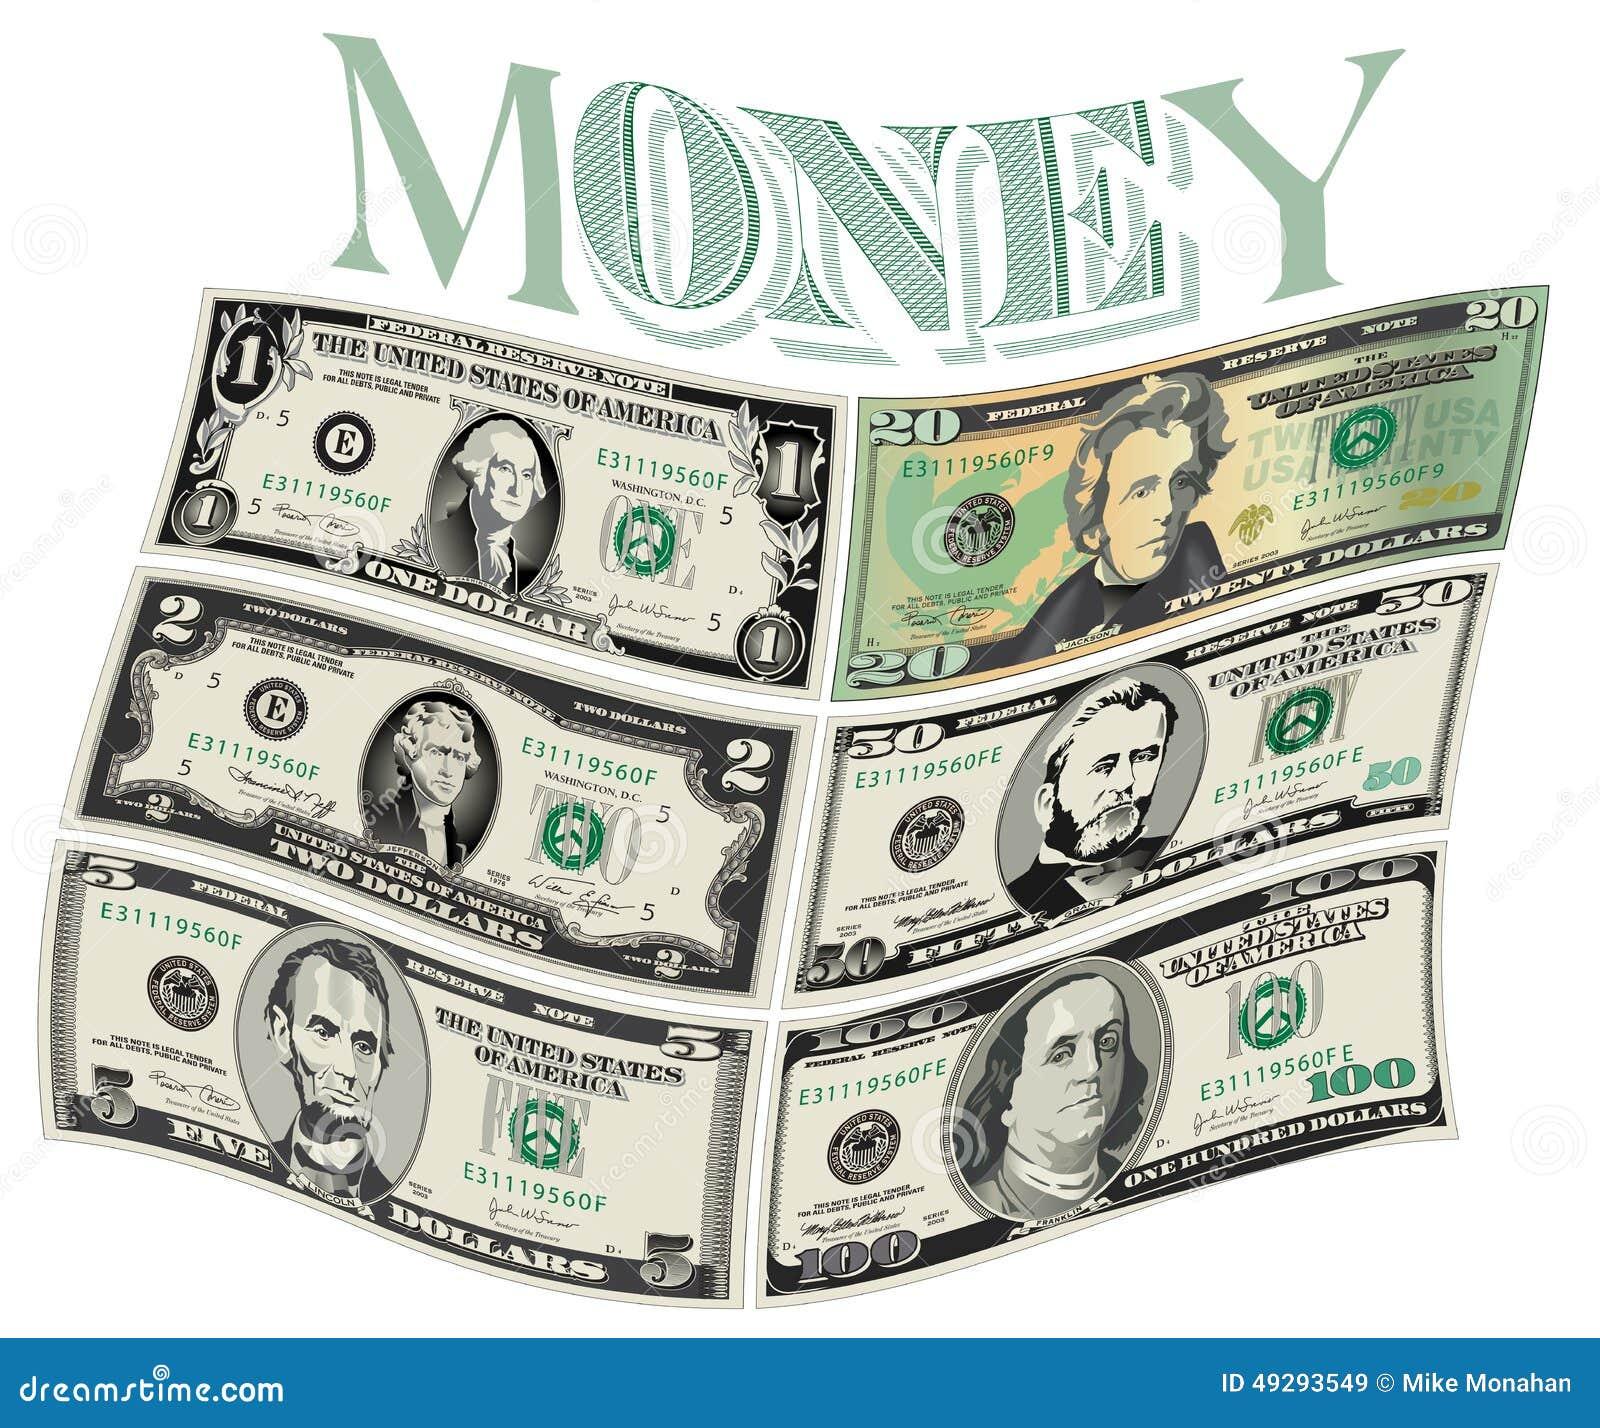 Stylized drawings of Bills